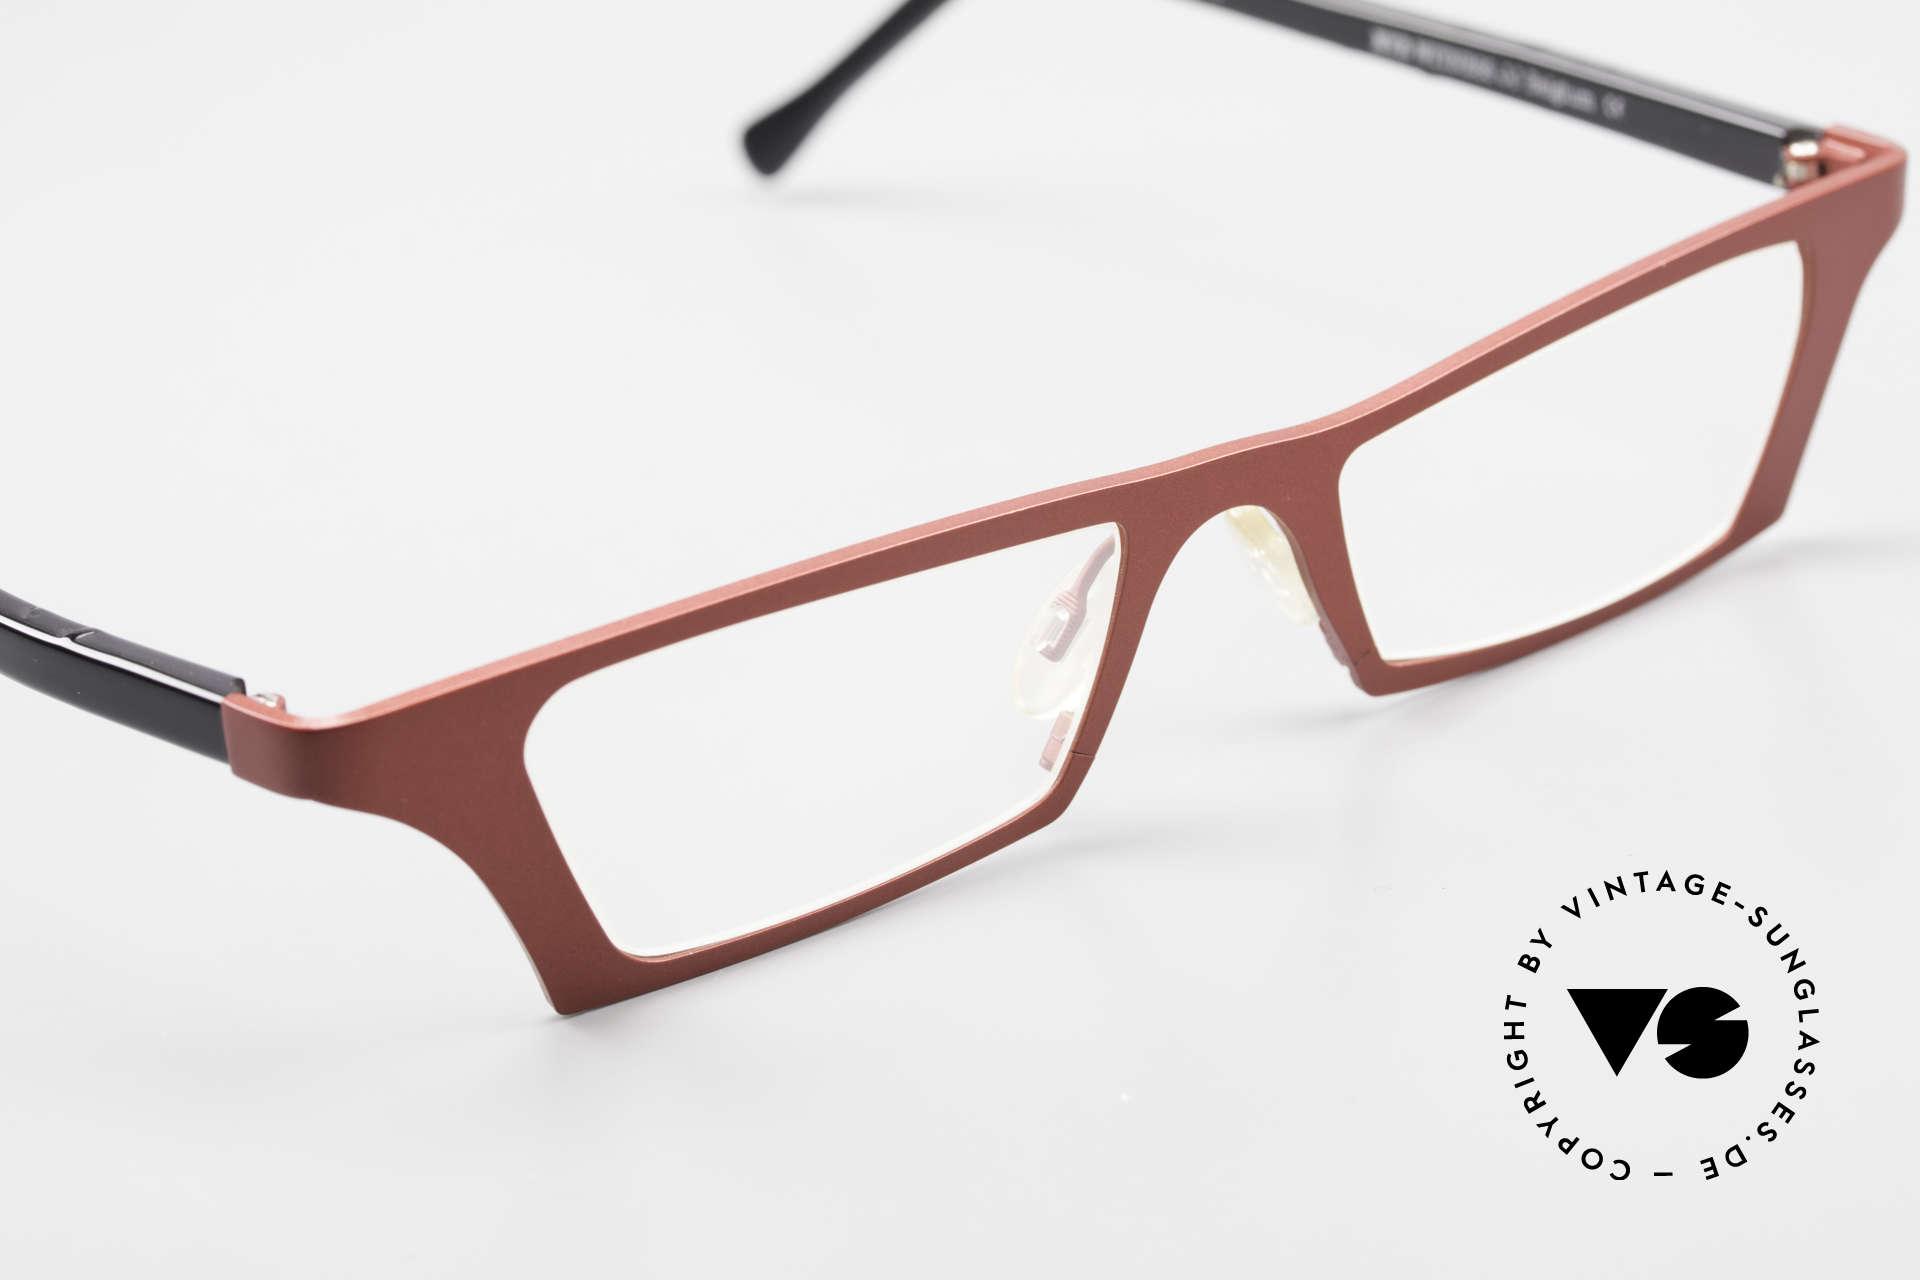 Theo Belgium Eye-Witness JJ Ladies Glasses Pure Titanium, so to speak: vintage eyeglasses with representativeness, Made for Women